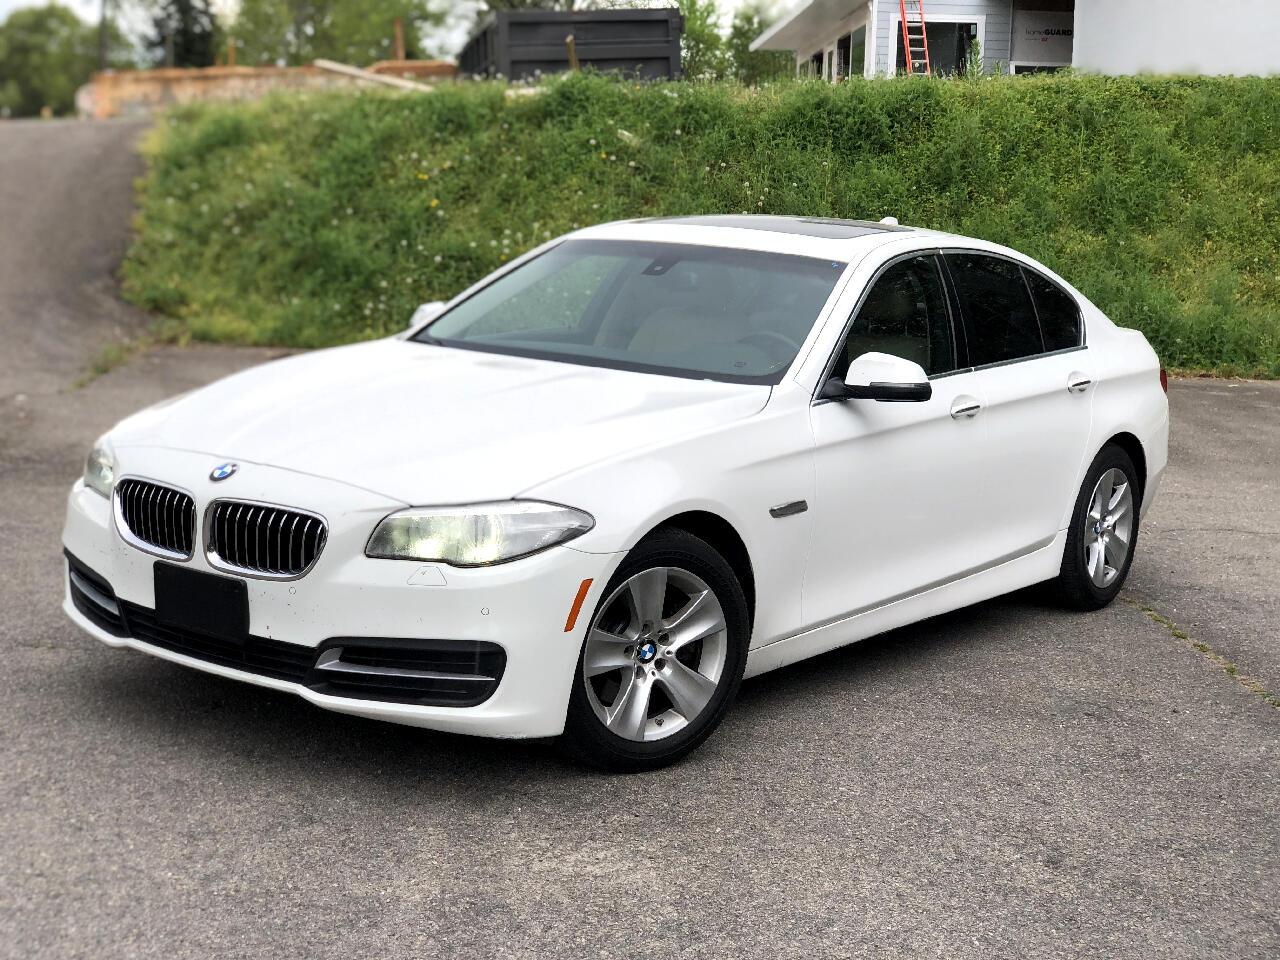 BMW 5 Series 4dr Sdn 528i RWD 2014